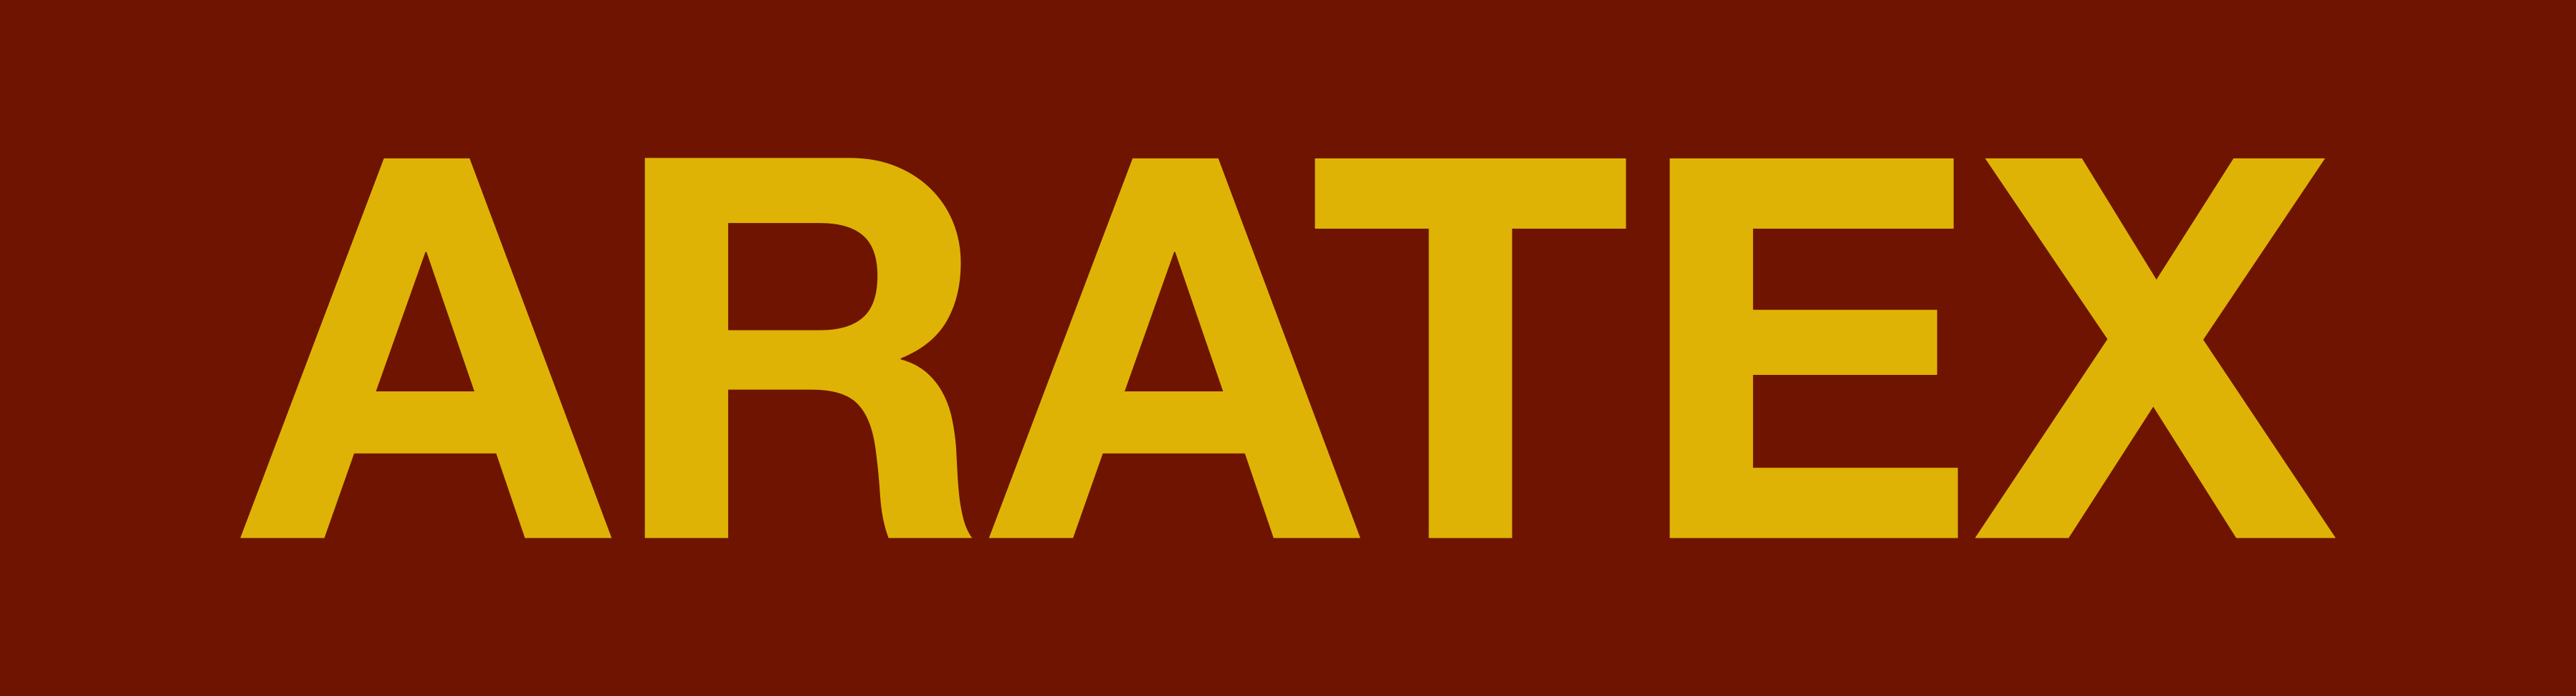 Aratex